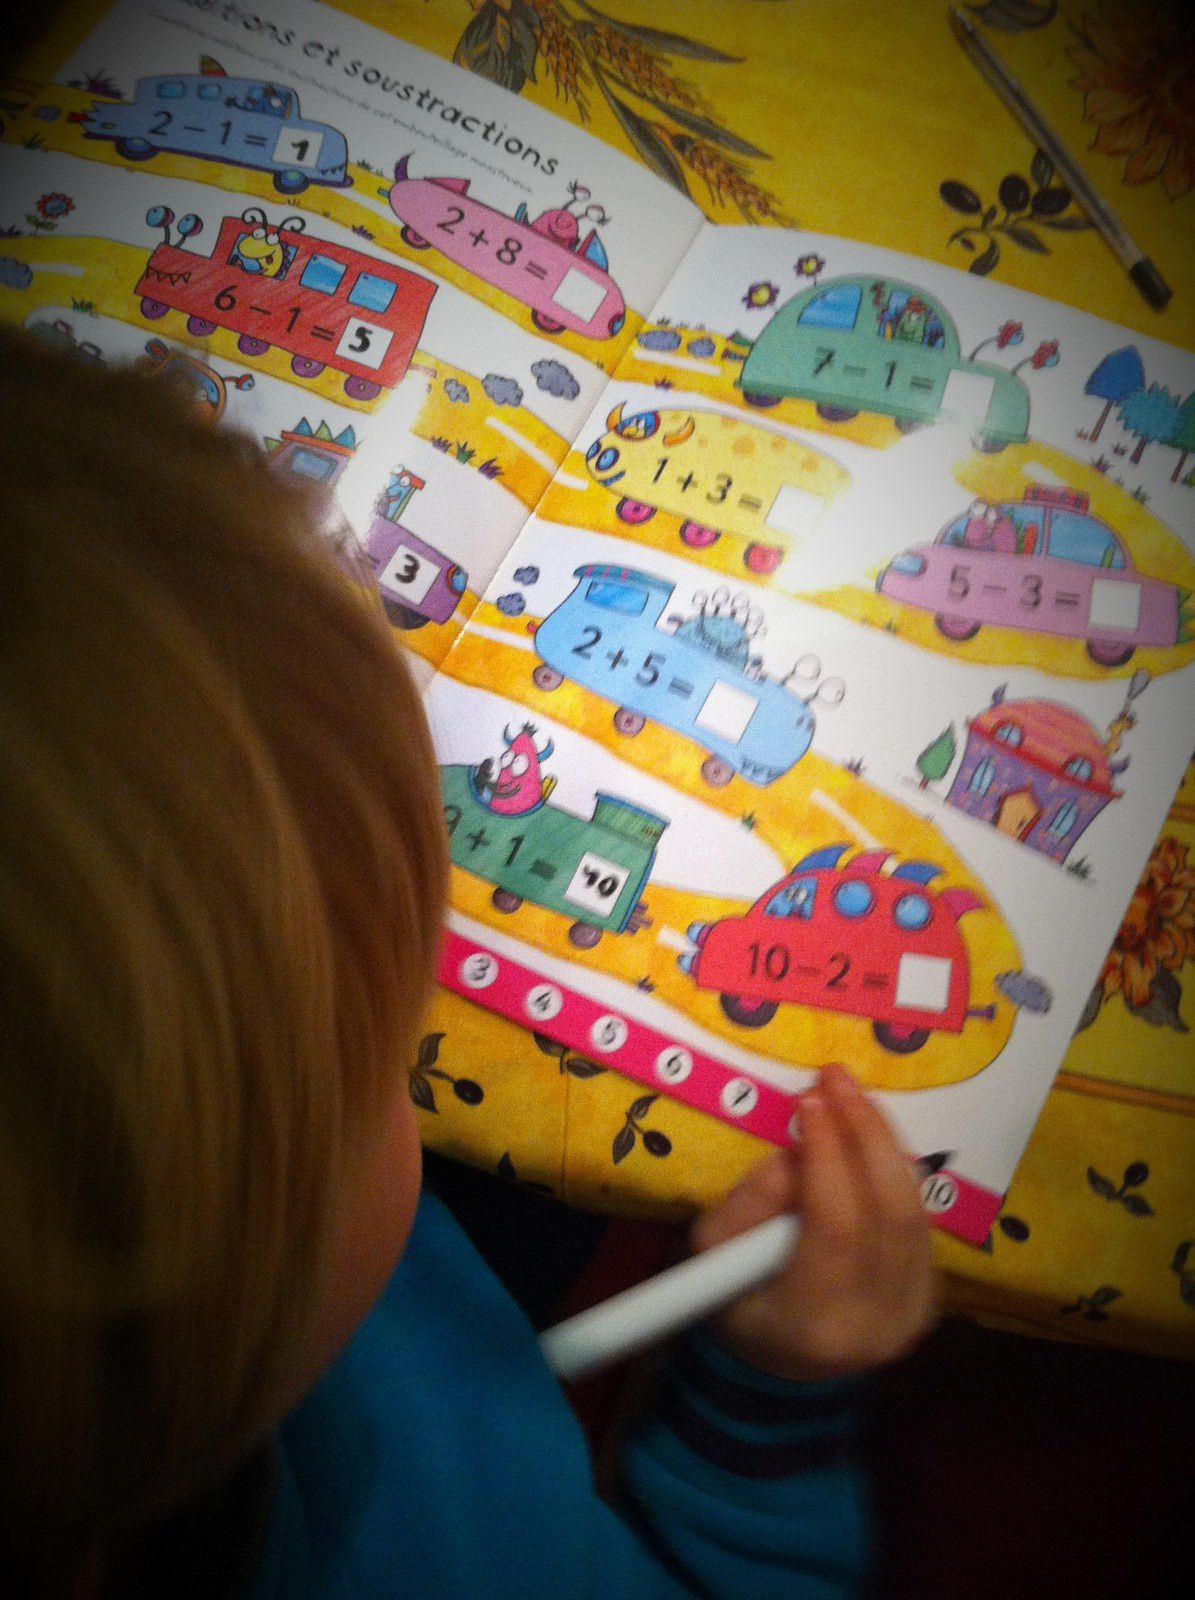 Chut les enfants lisent #95 Je trace, j'efface Addition-soustraction